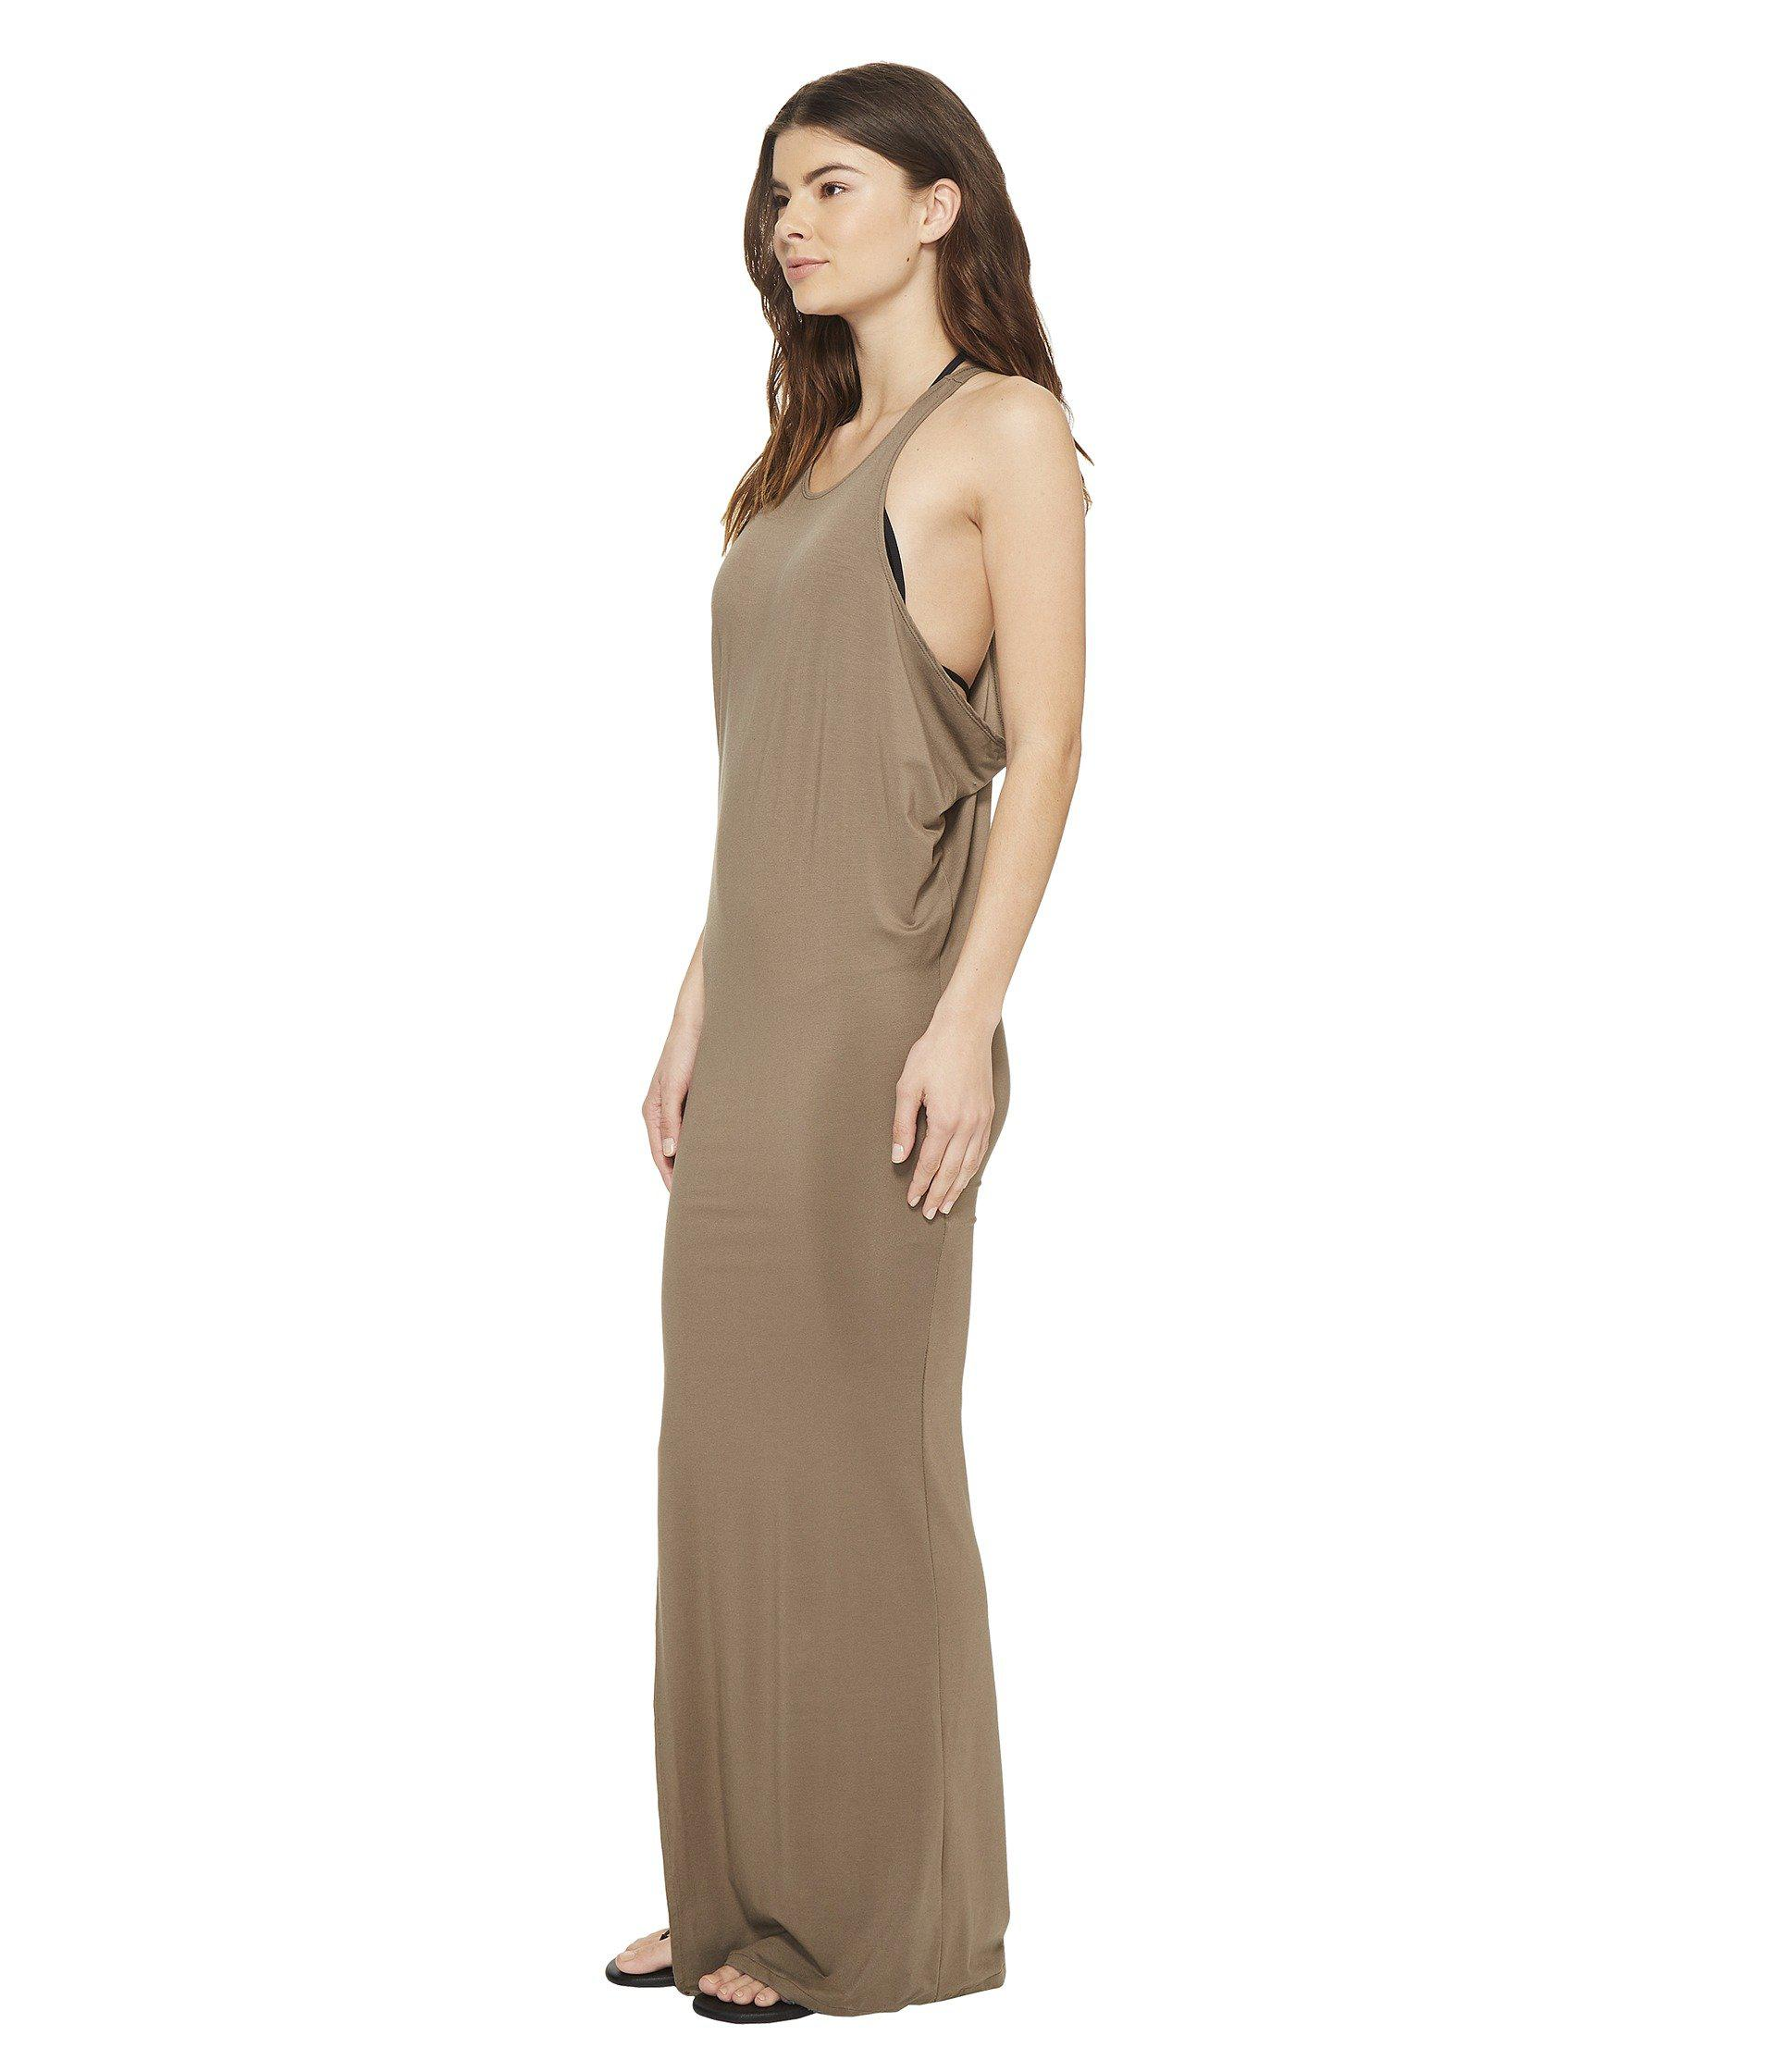 801f44eecc Lyst - Mikoh Swimwear Mavericks High Neck Maxi Dress